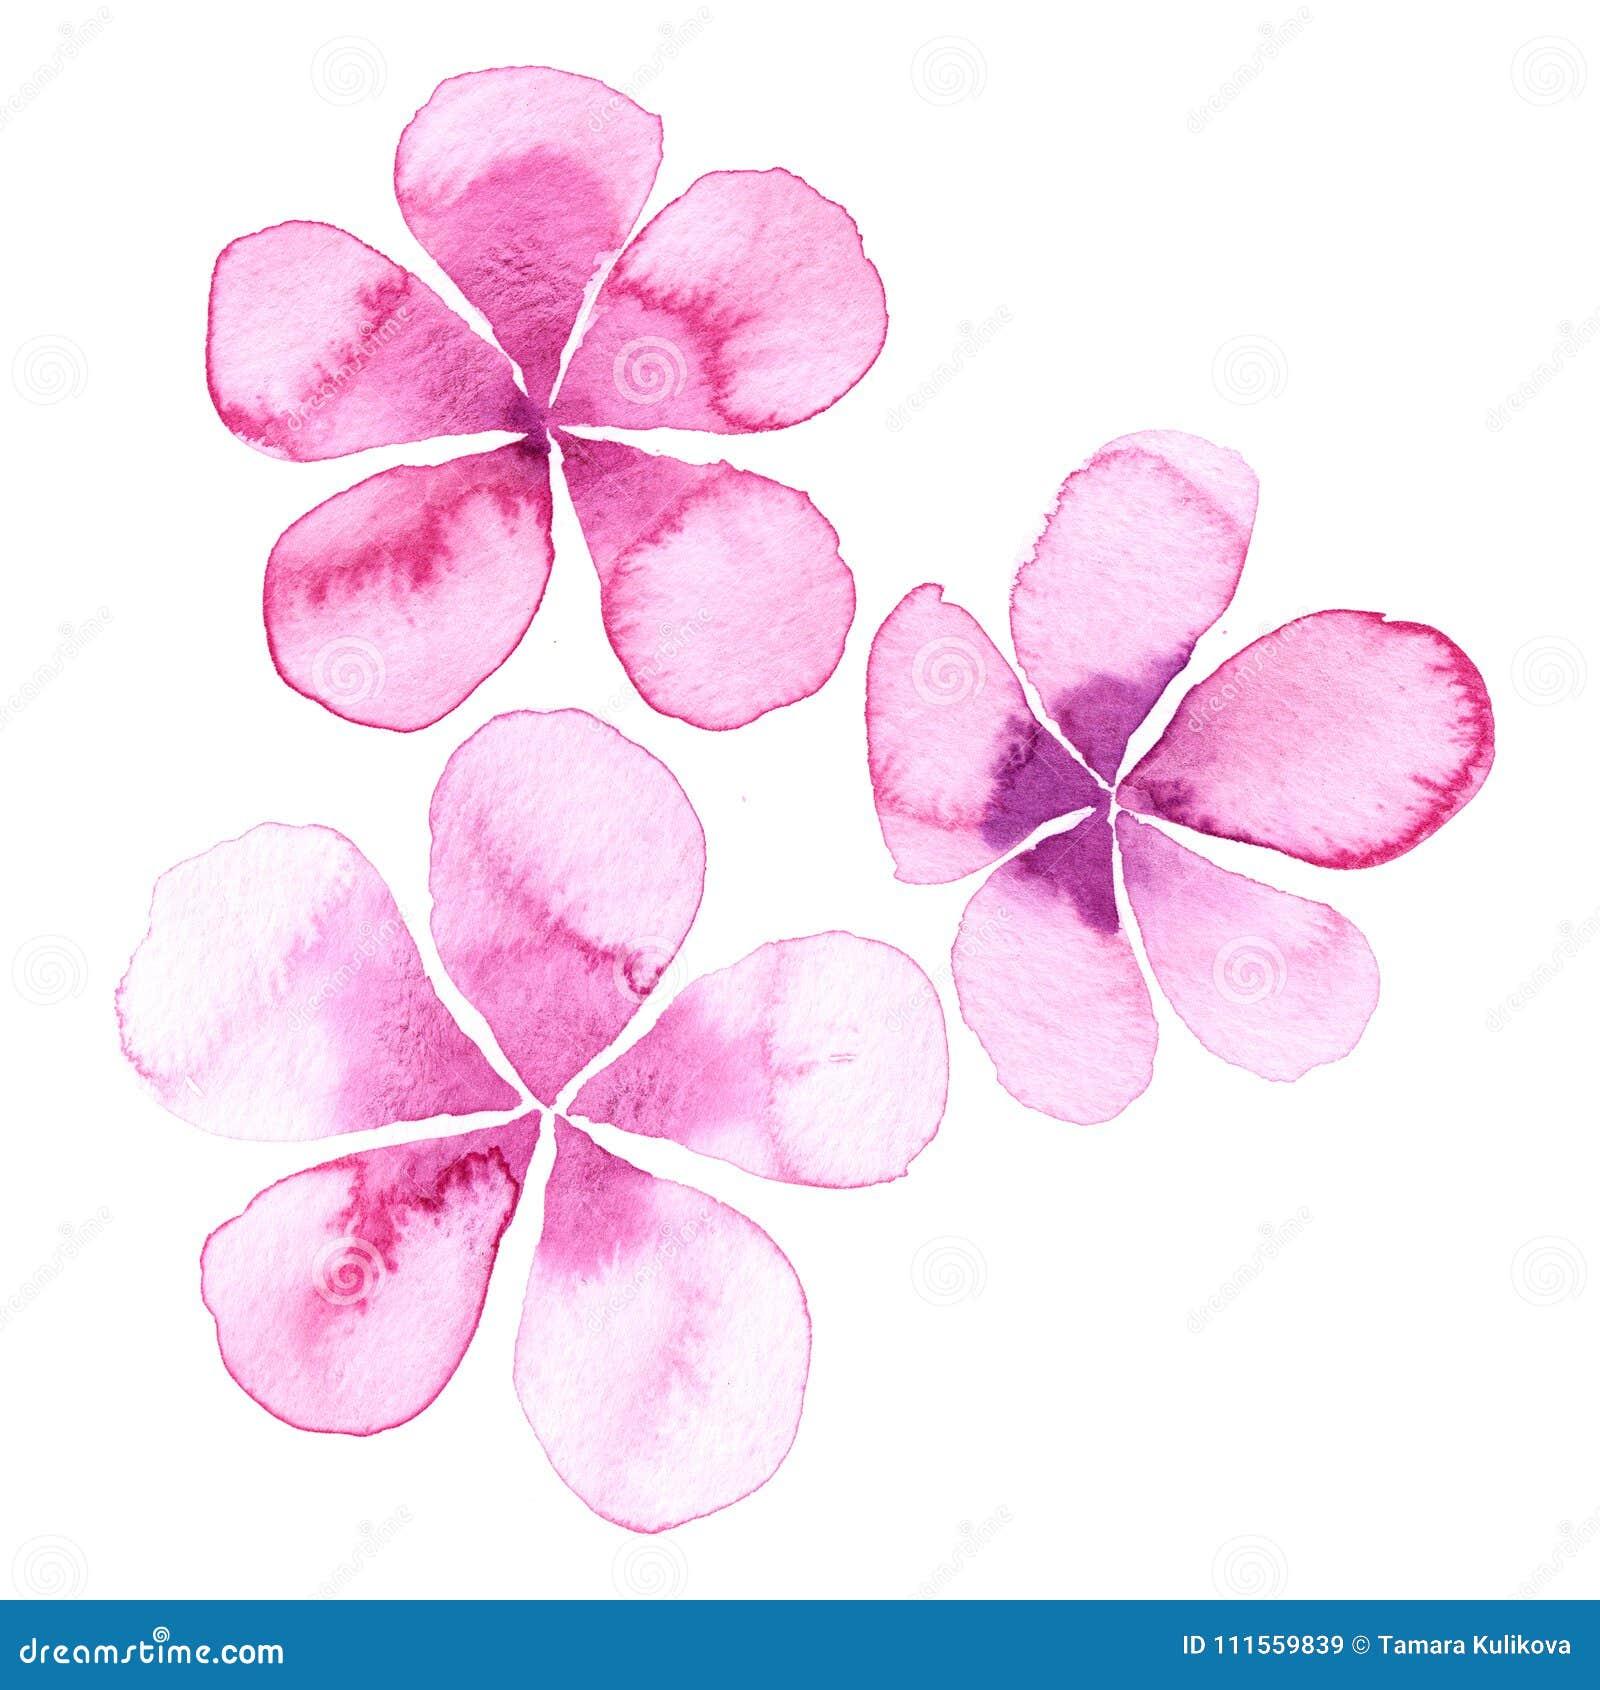 Simple Watercolor Flowers Stock Illustration Illustration Of Petals 111559839